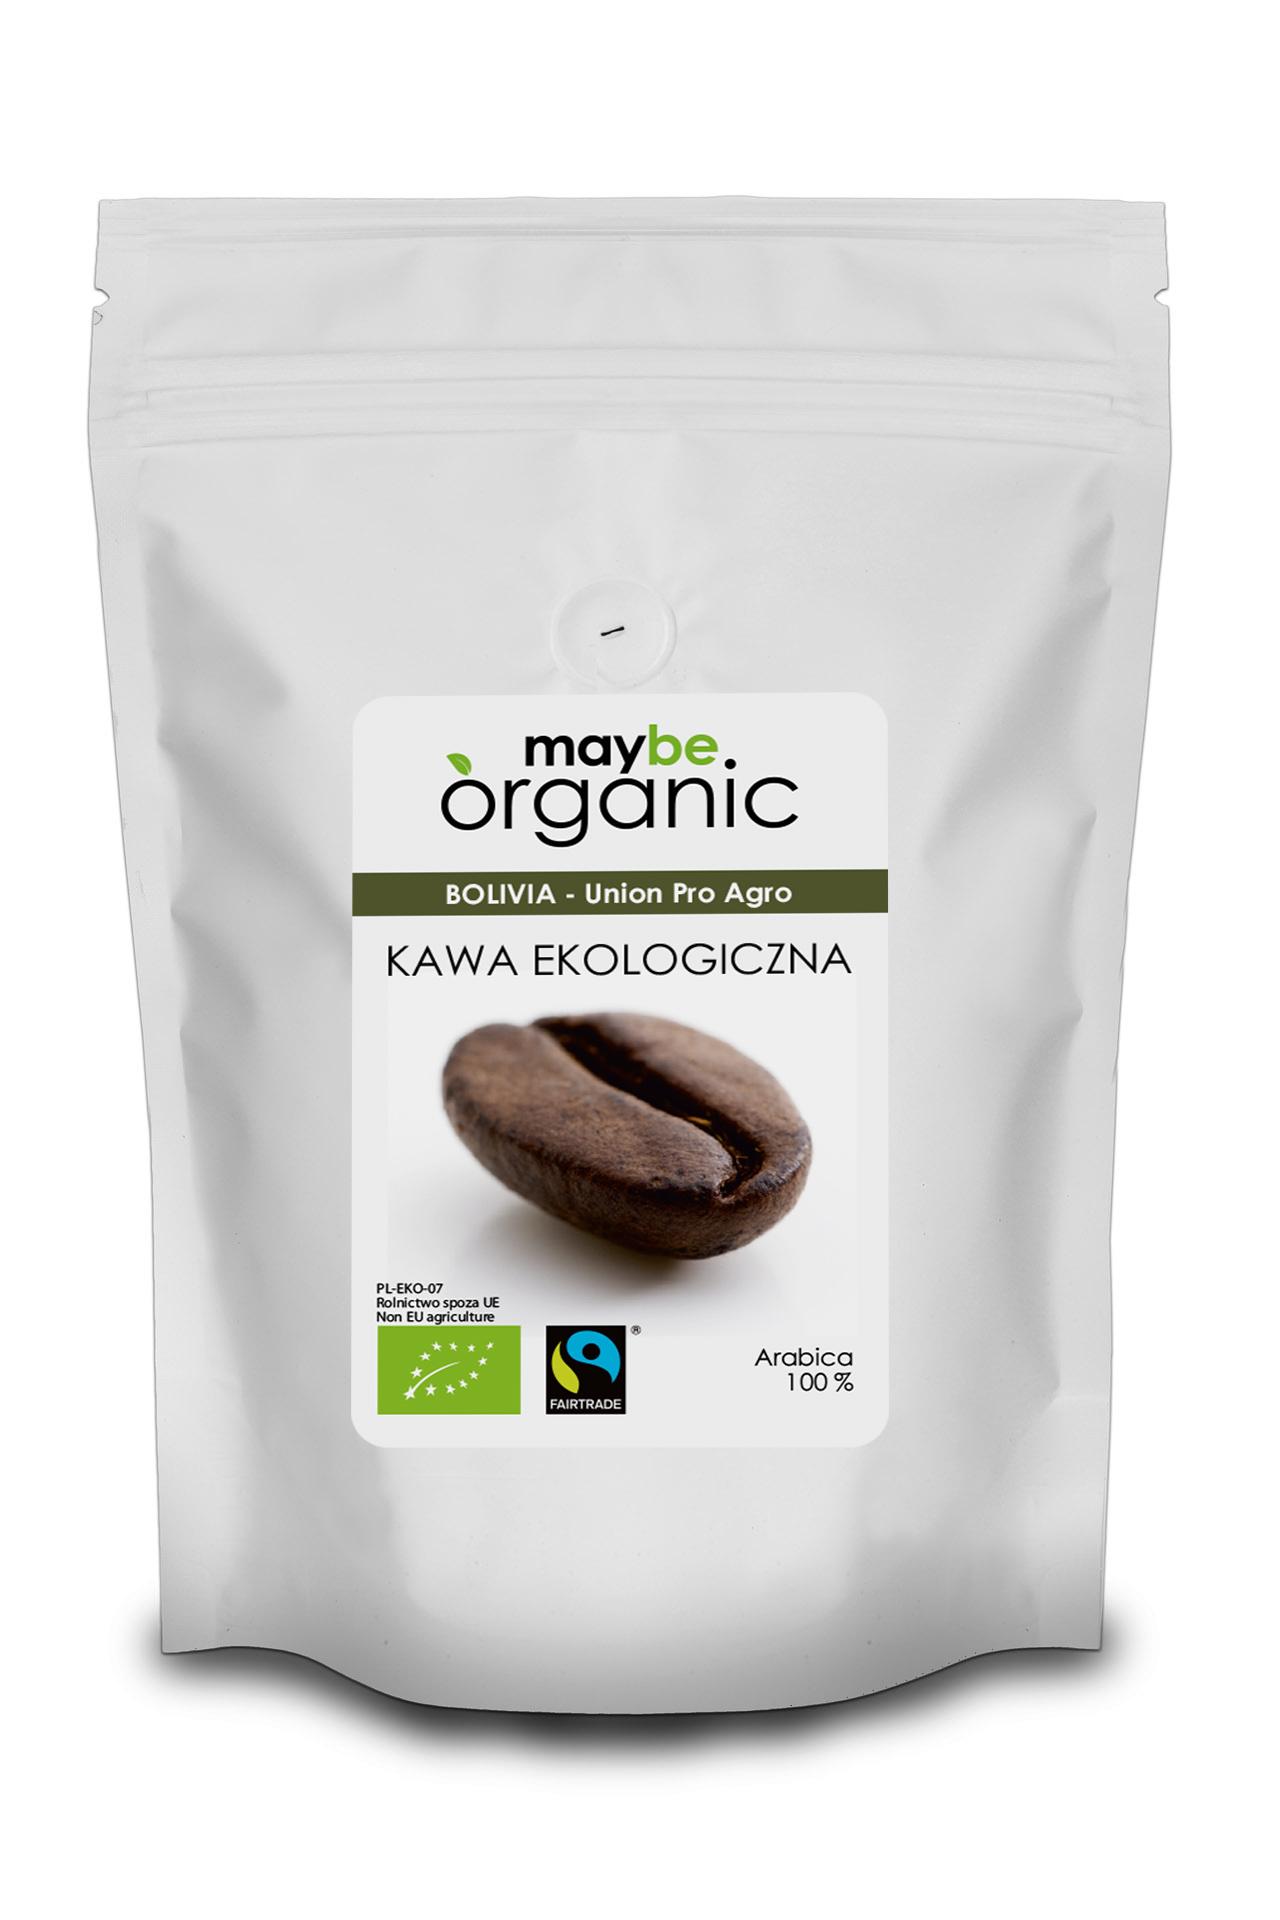 Bolivia Union Pro Agro